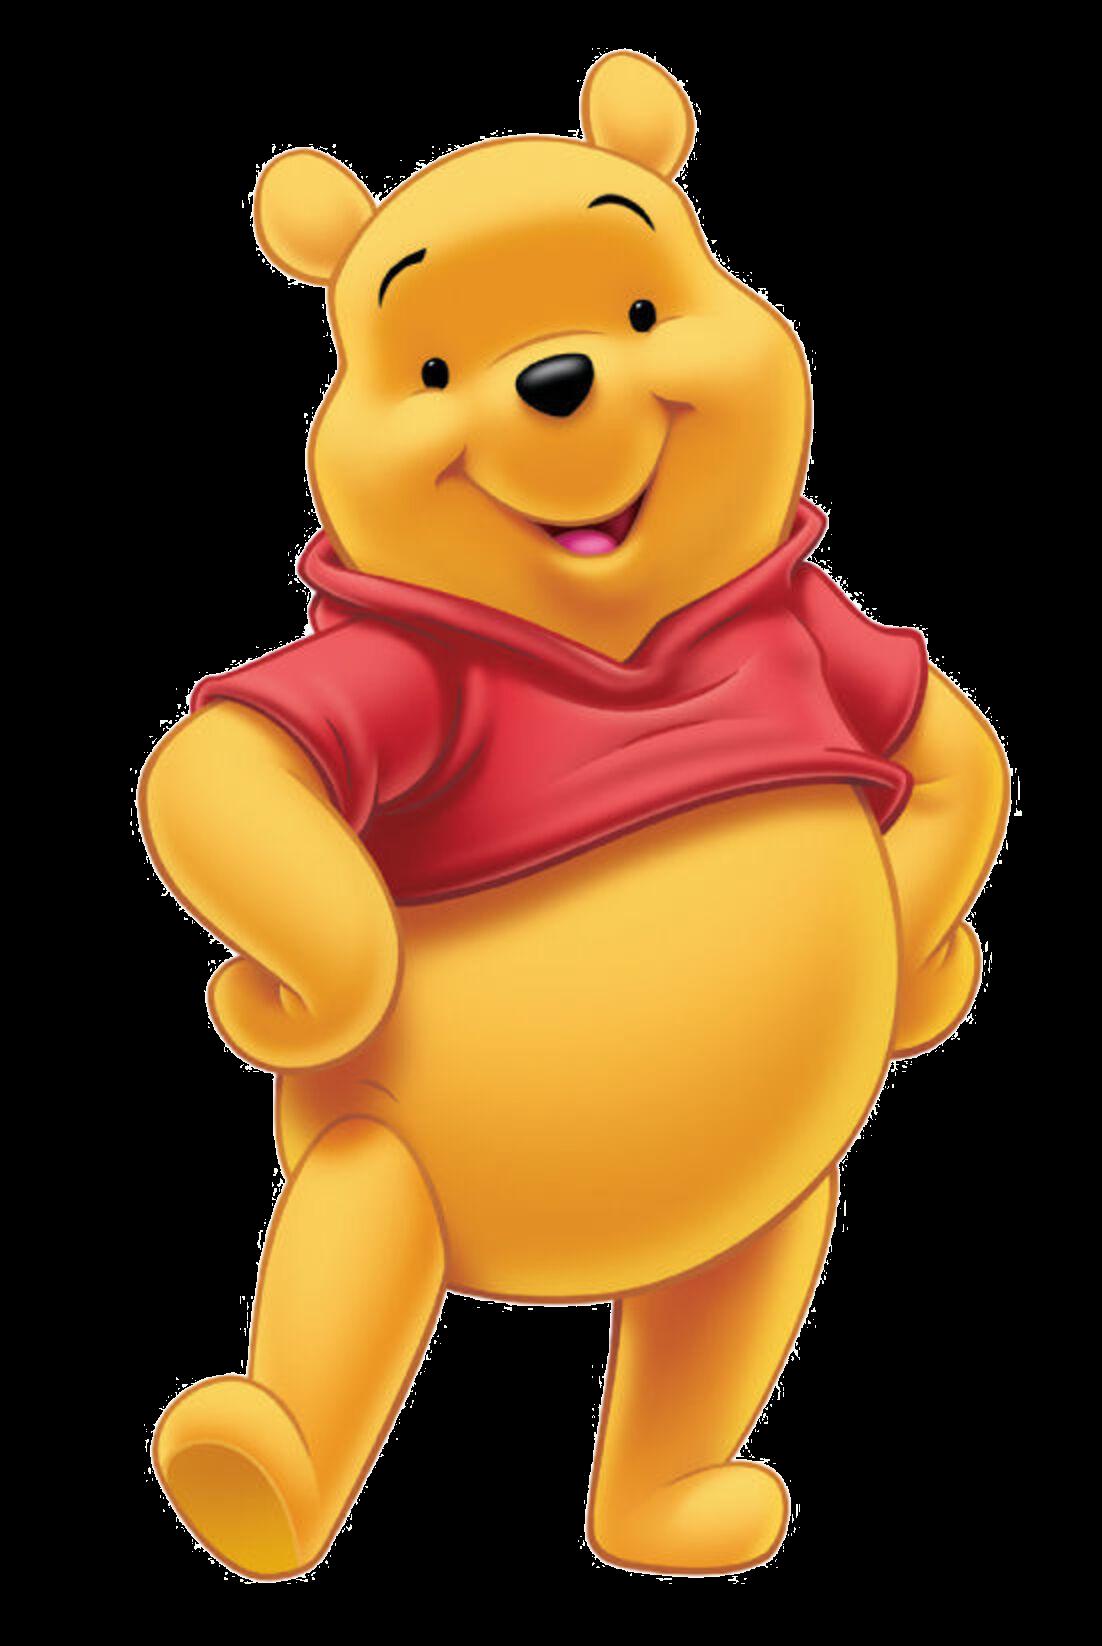 Image winnie the poohg disney wiki fandom powered by wikia winnie the poohg voltagebd Image collections